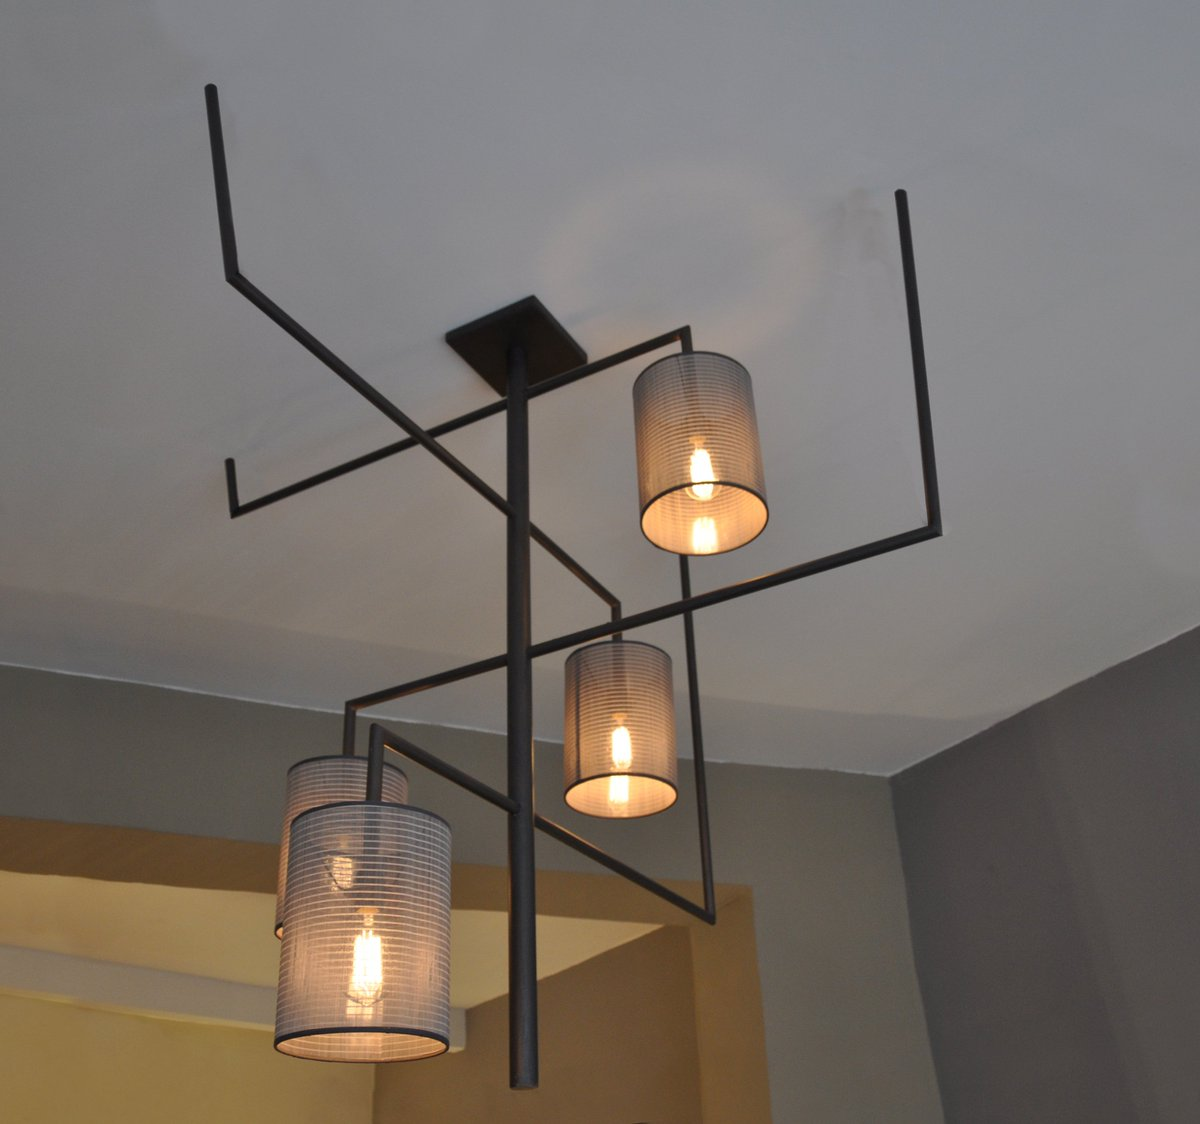 girard sudron girard sudron twitter. Black Bedroom Furniture Sets. Home Design Ideas